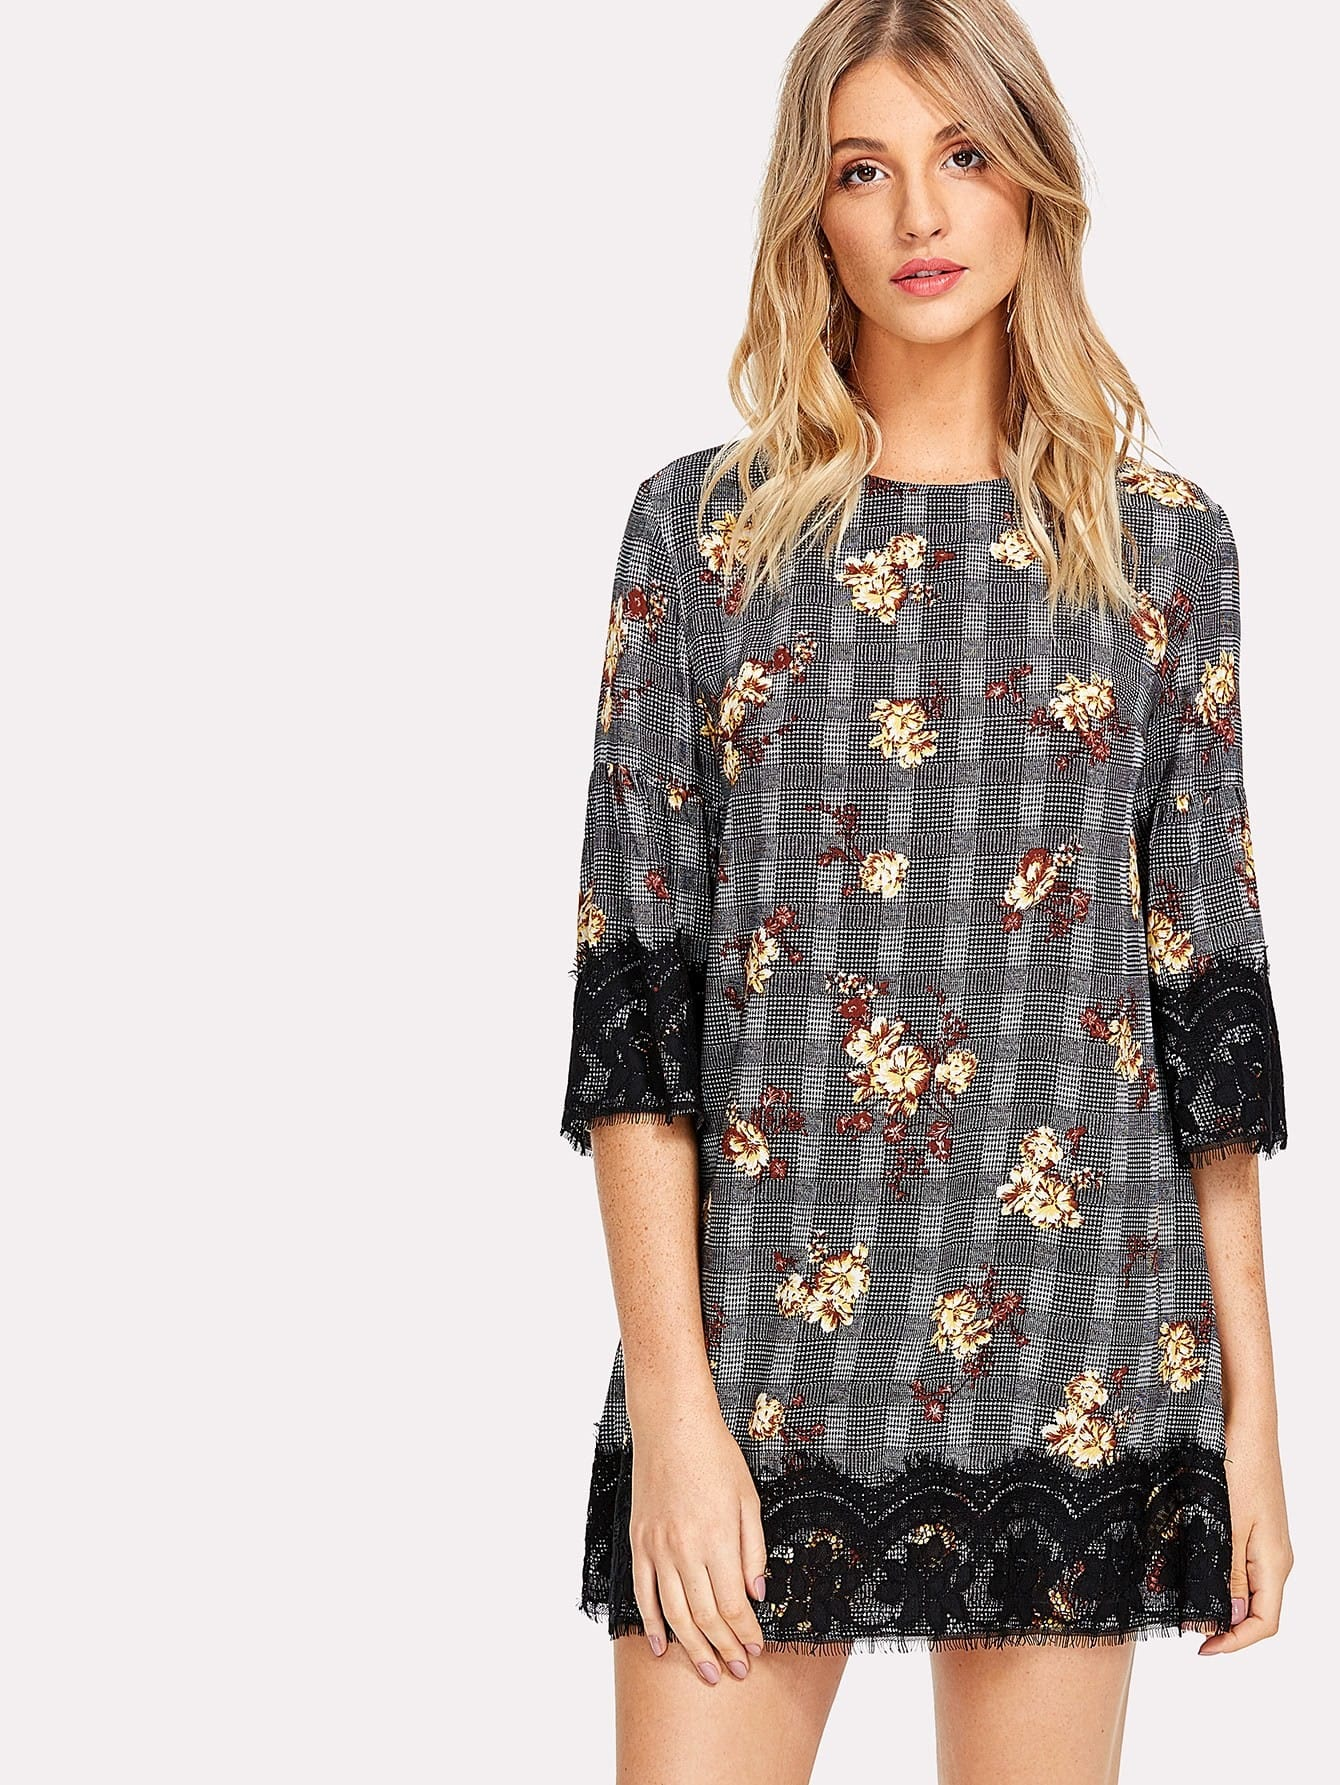 Flower And Plaid Print Lace Hem Dress